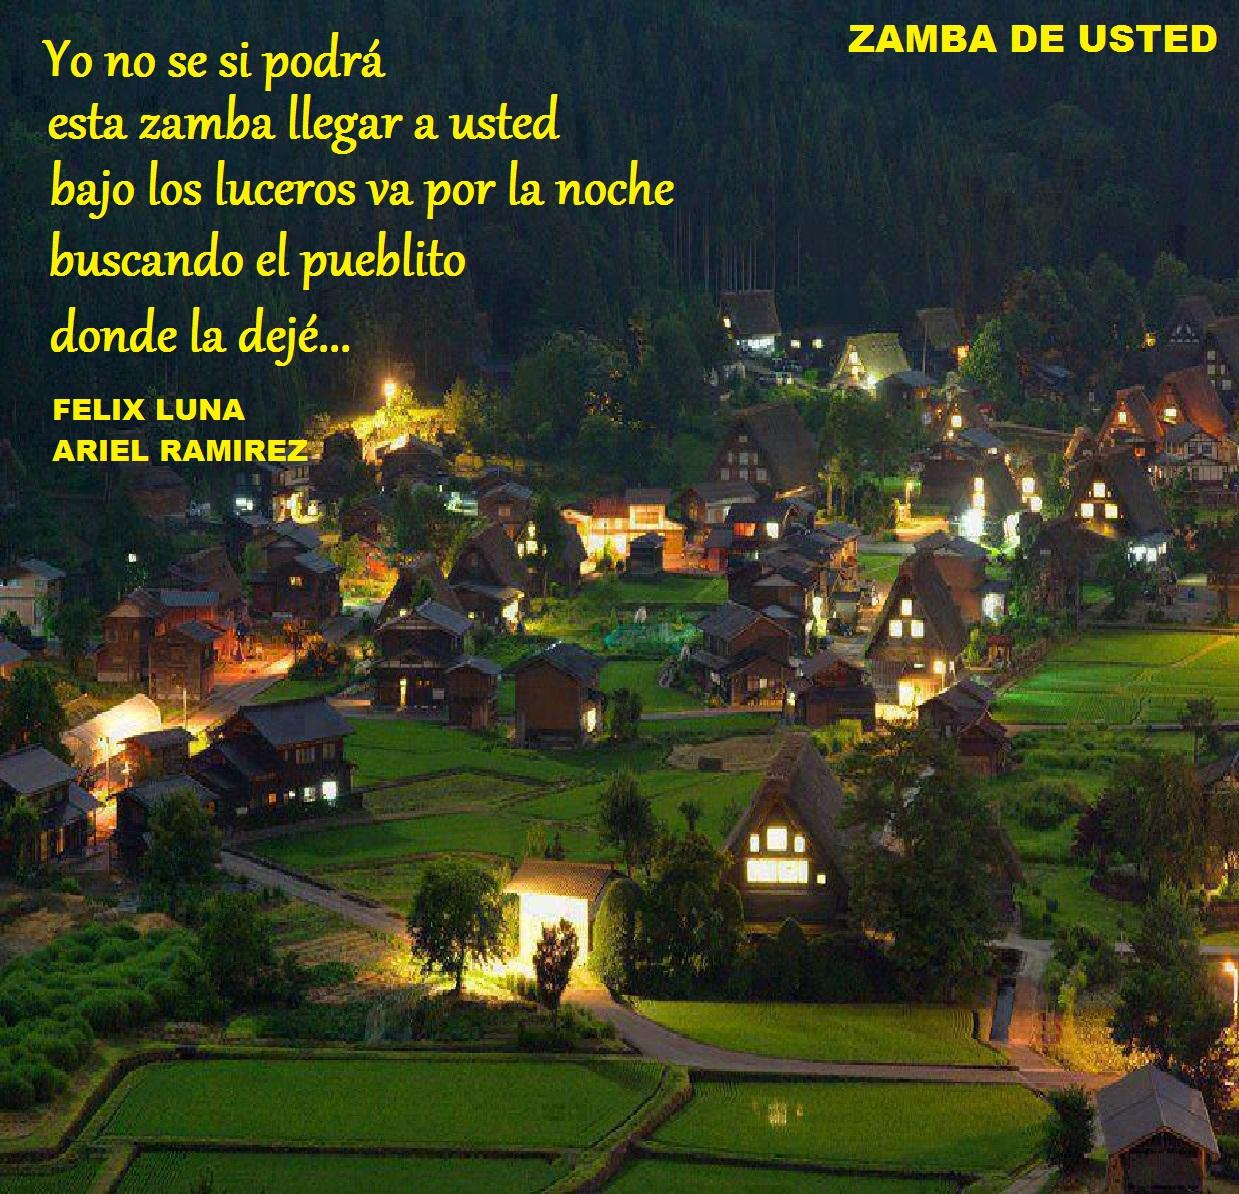 ZAMBA DE USTED (Felix Luna y Ariel Ramirez